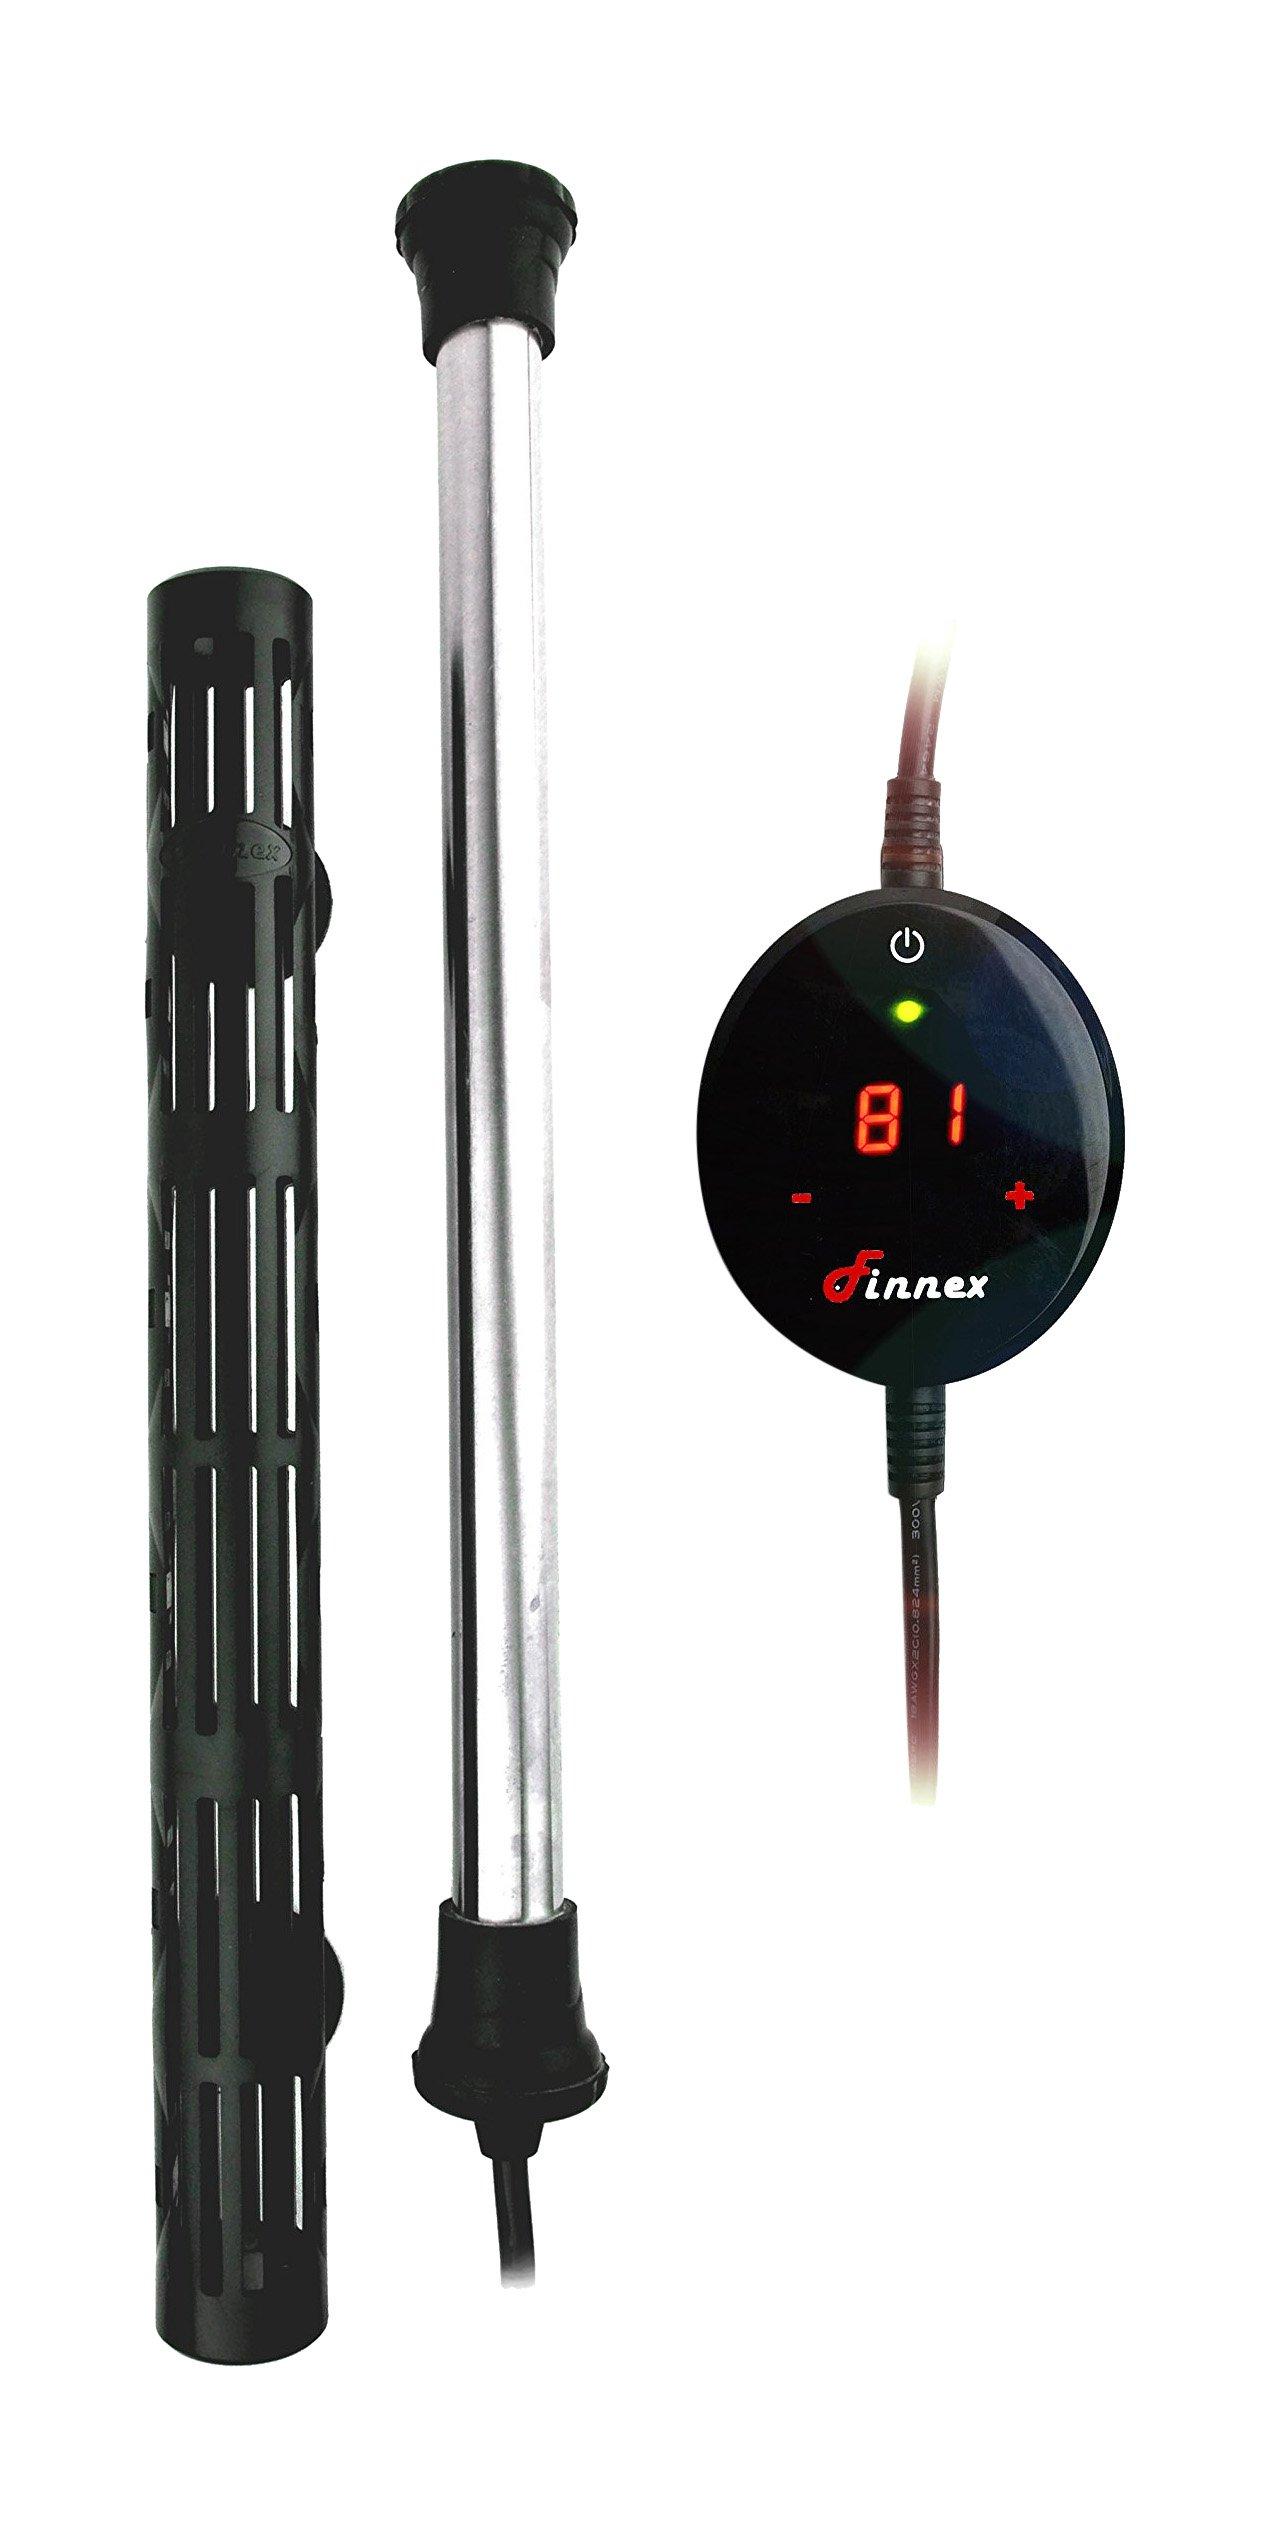 Finnex 50W Digital Touch Control Aquarium Titanium Heater Guard by Finnex (Image #1)